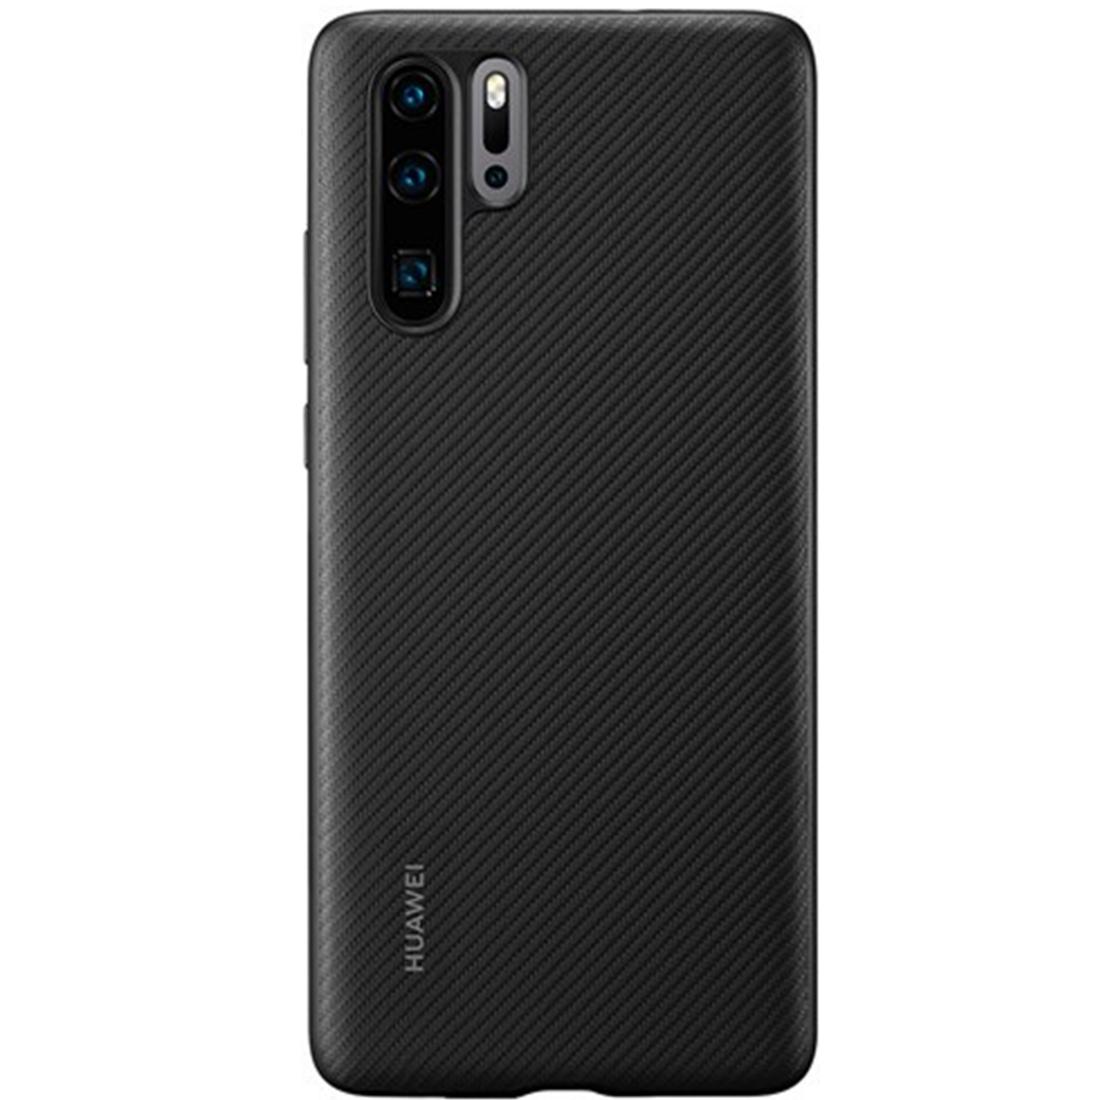 Capac protectie spate Huawei PU Cover pentru Huawei P30 Pro Black